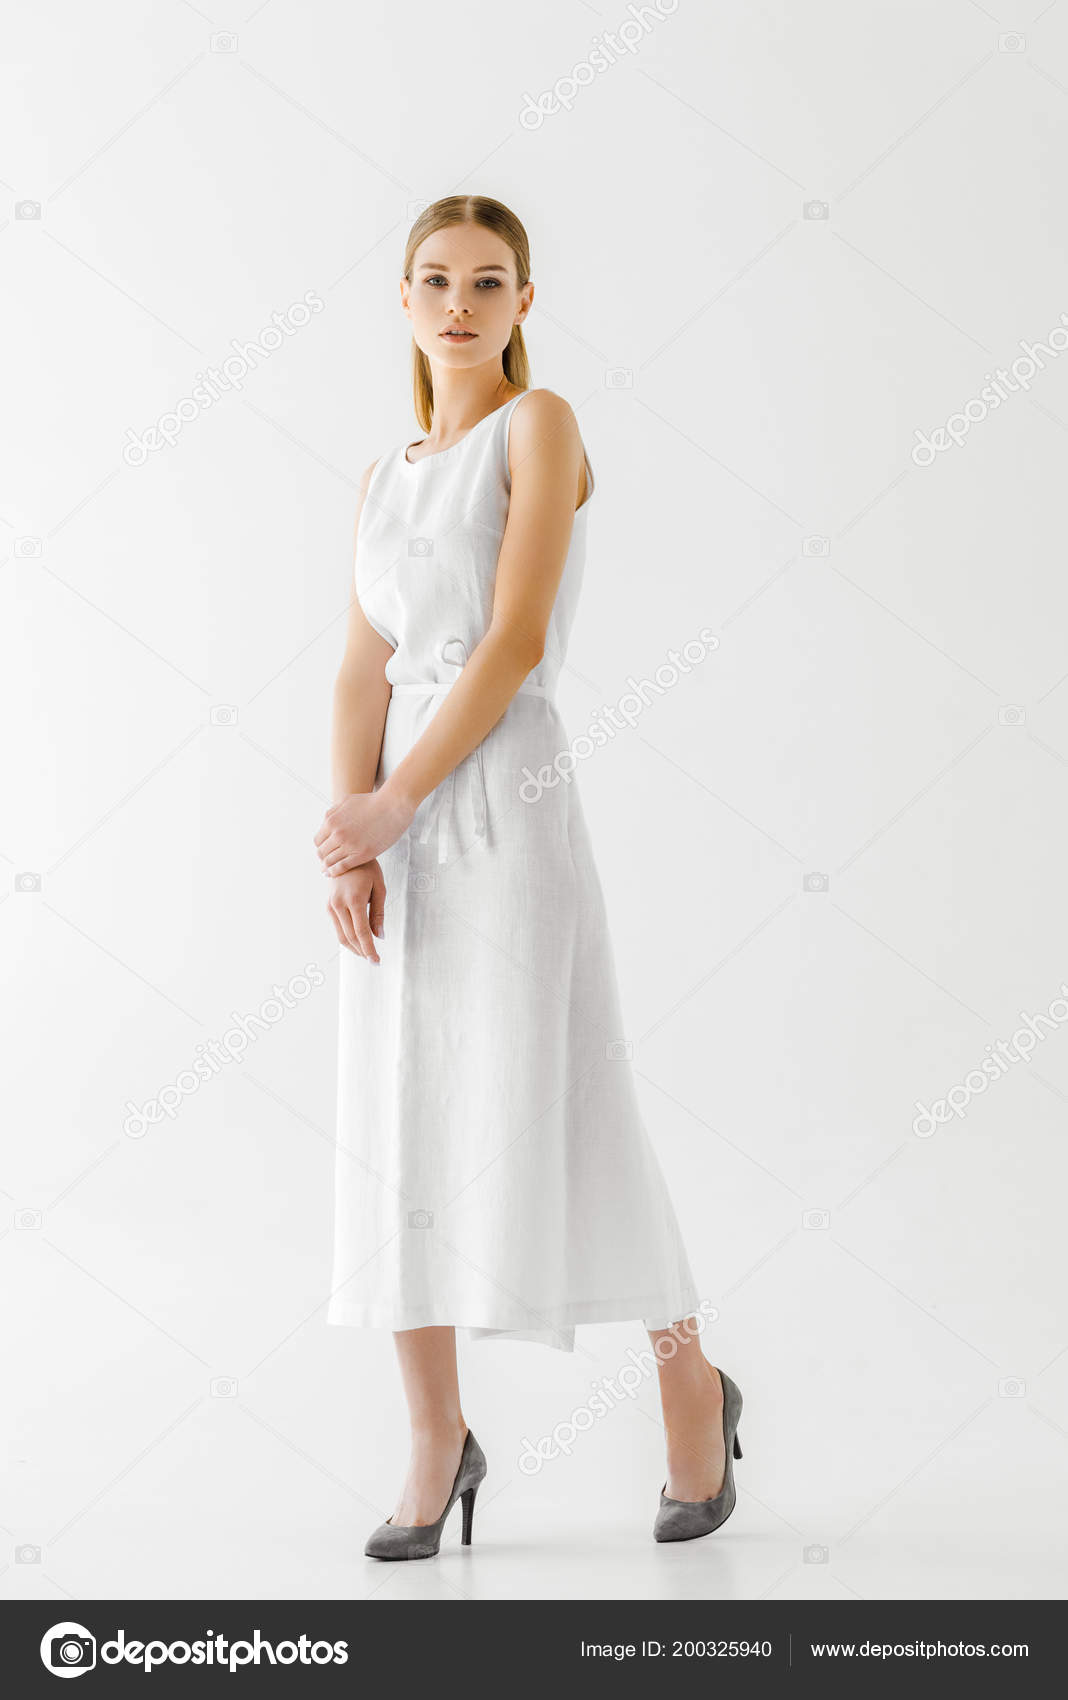 20cc33b0c8 Bela Modelo Feminino Vestido Branco Linho Posando Isolado Fundo Cinza —  Fotografia de Stock